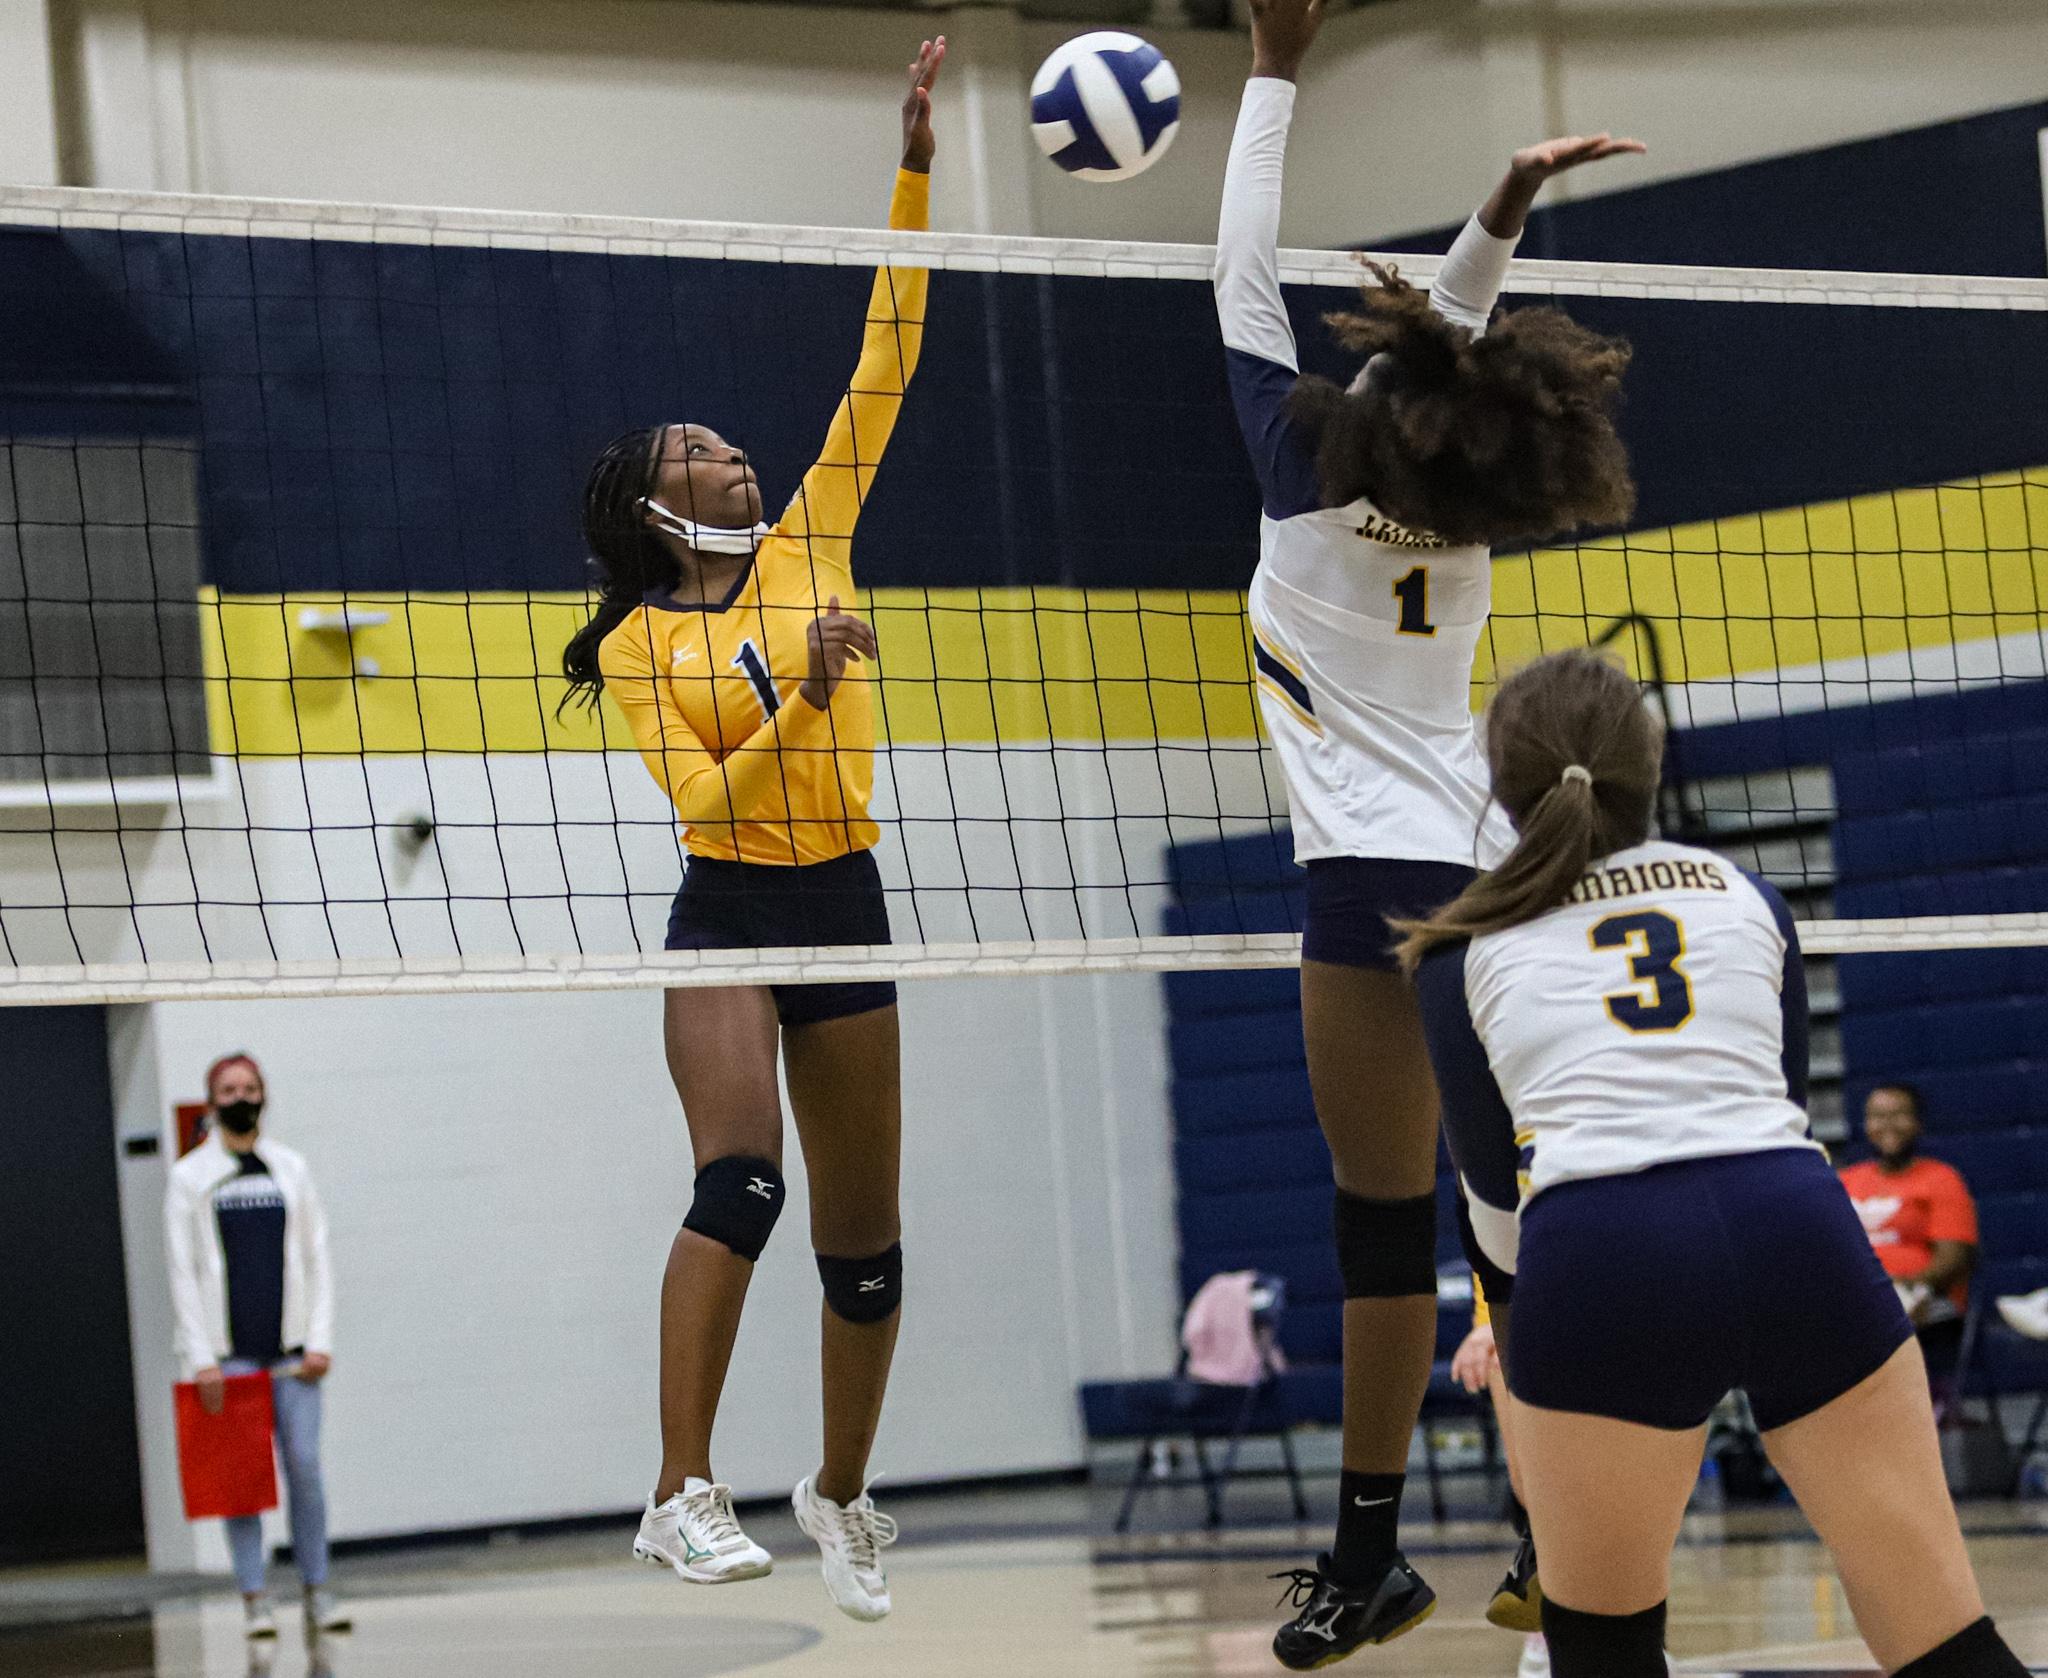 Volleyball: Goldsboro Wins Regular-Season Finale Against Eastern Wayne (PHOTO GALLERY)